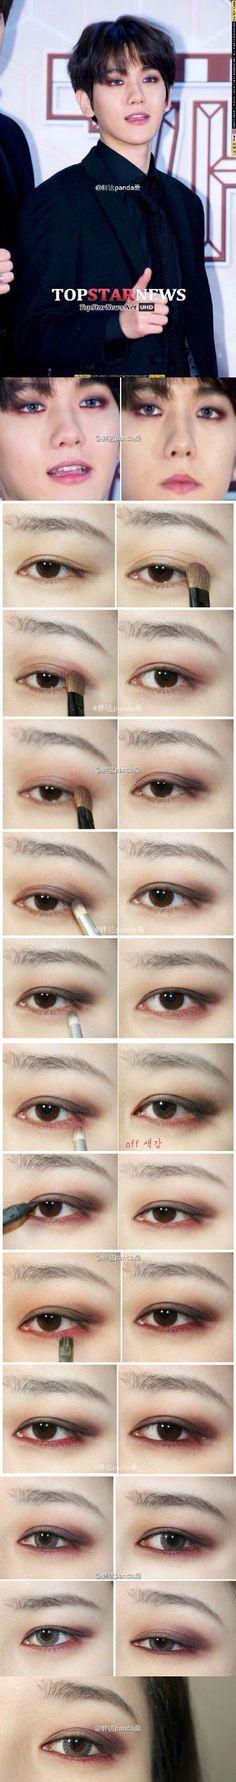 EXO Baekhyun's smoky red brown make up tutorial (cr.1208_sj)